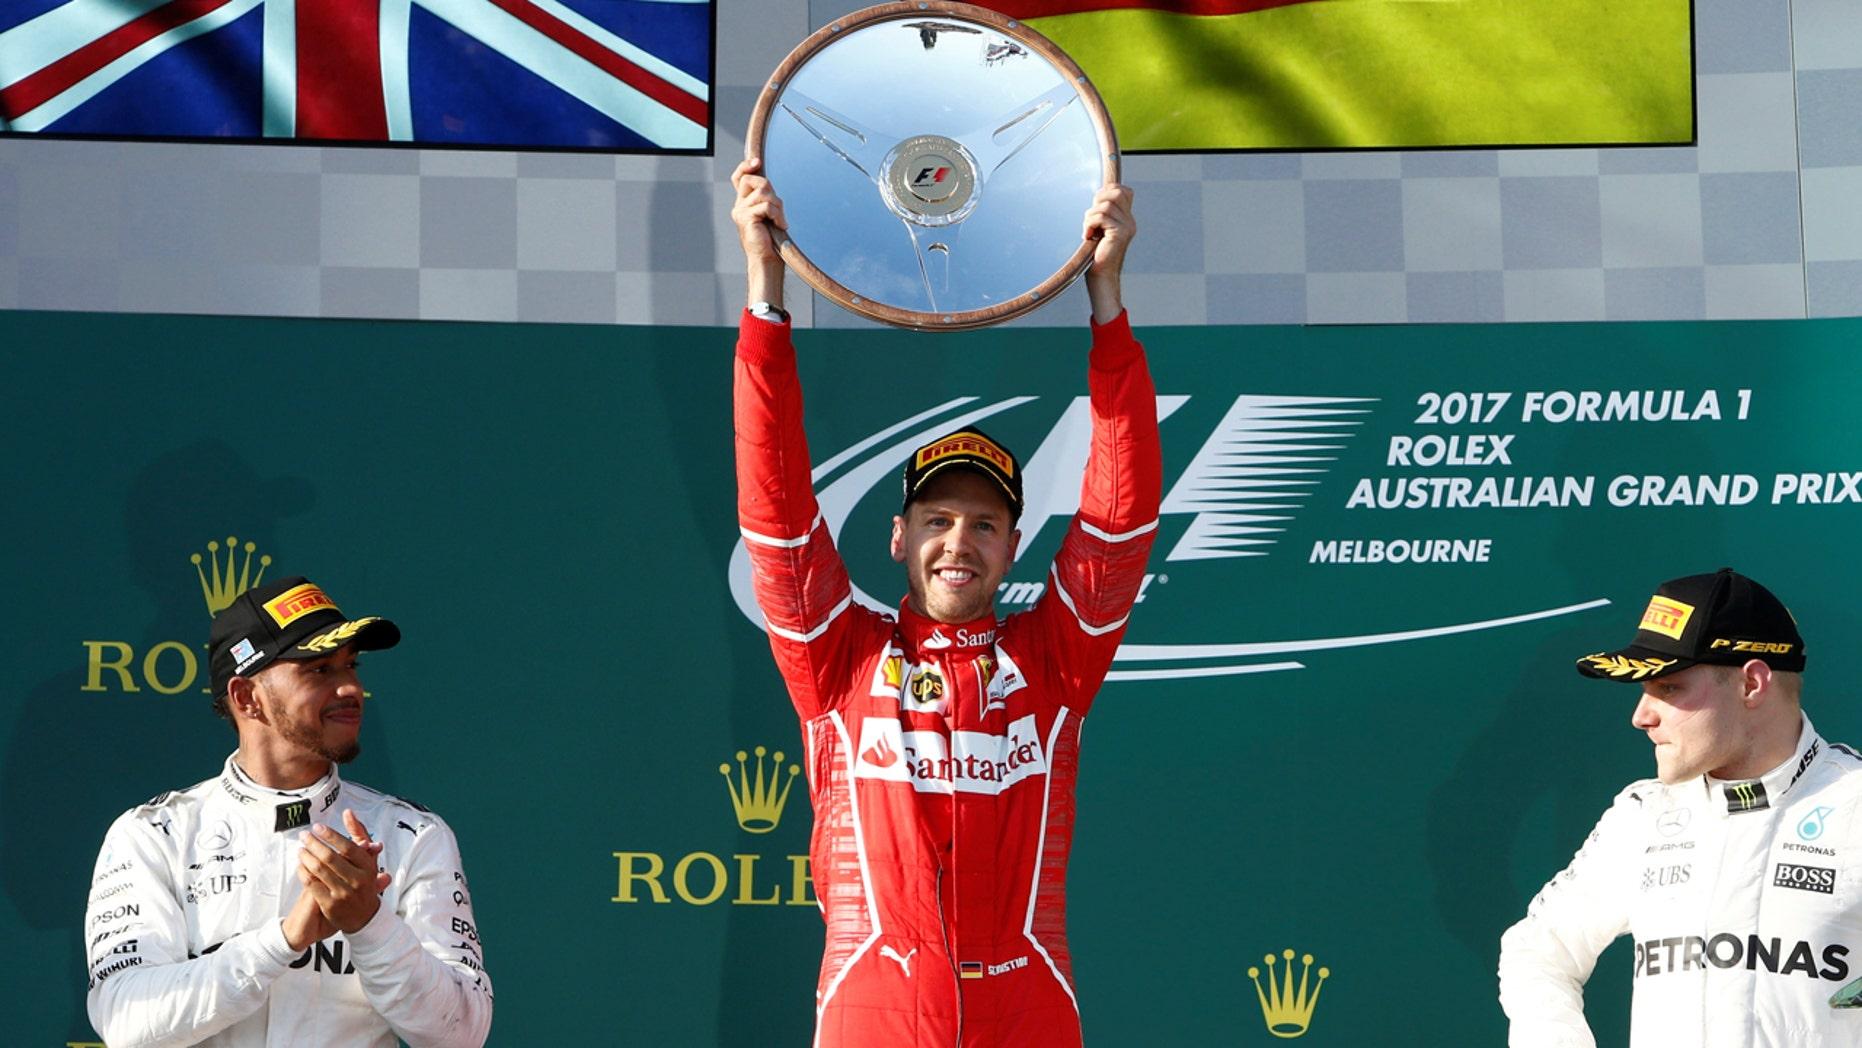 Formula One - F1 - Australian Grand Prix - Melbourne, Australia - 26/03/2017 - Ferrari driver Sebastian Vettel of Germany (C) celebrates alongside Mercedes driver Lewis Hamilton of Britain (L) and team mate Valtteri Bottas of Finland.    REUTERS/Brandon Malone     TPX IMAGES OF THE DAY - RTX32QM8